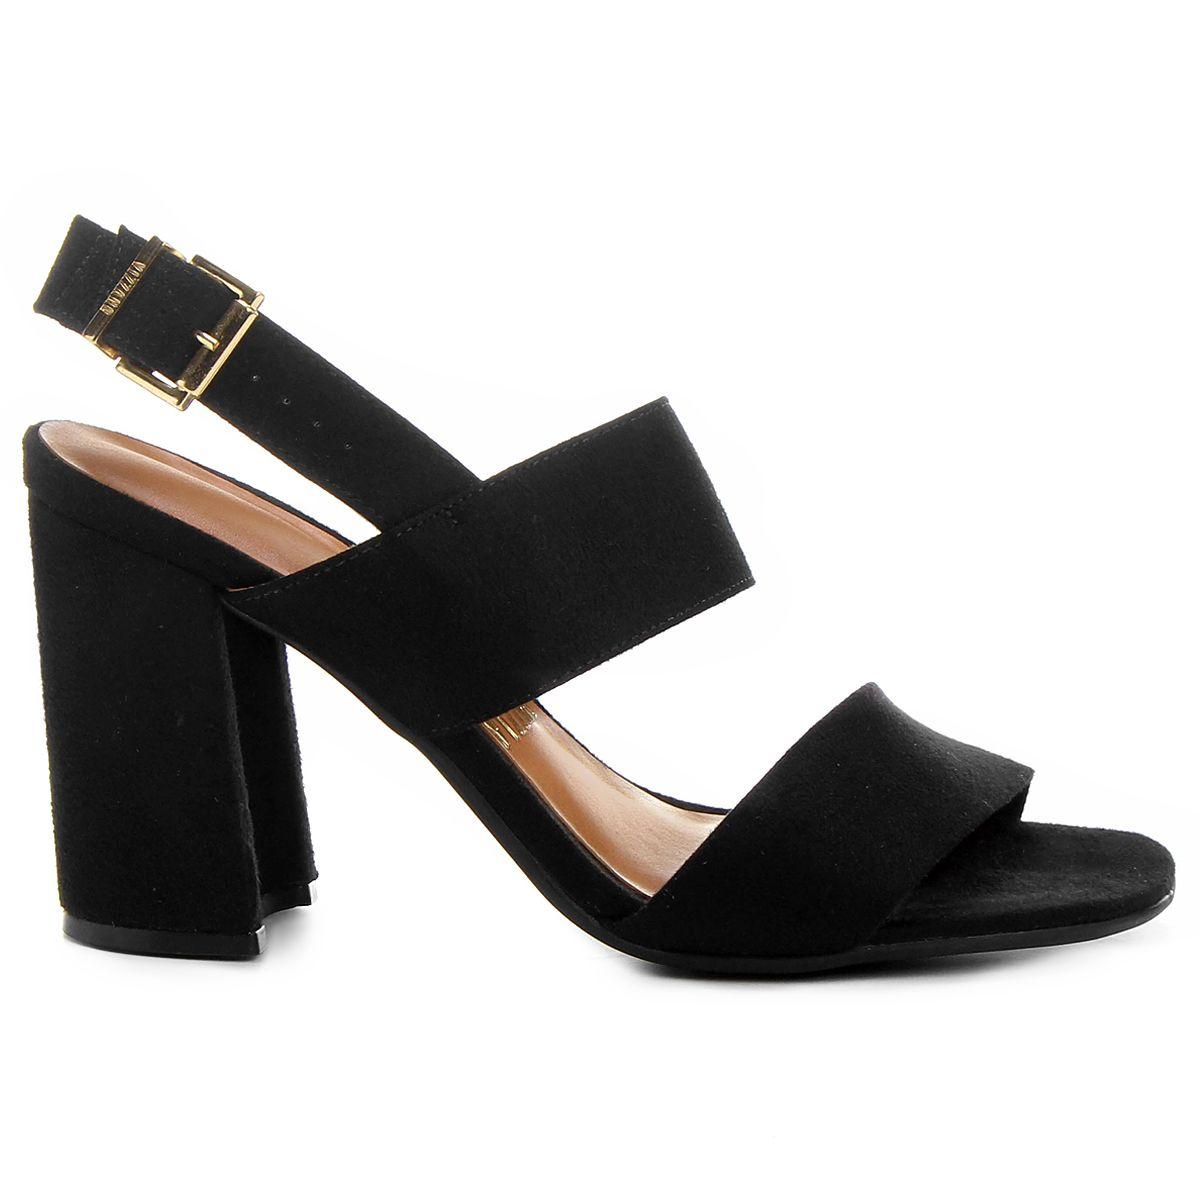 b523f114a8 Compre Sandália Vizzano Salto Grosso Tiras Preto na Zattini a nova loja de  moda online da